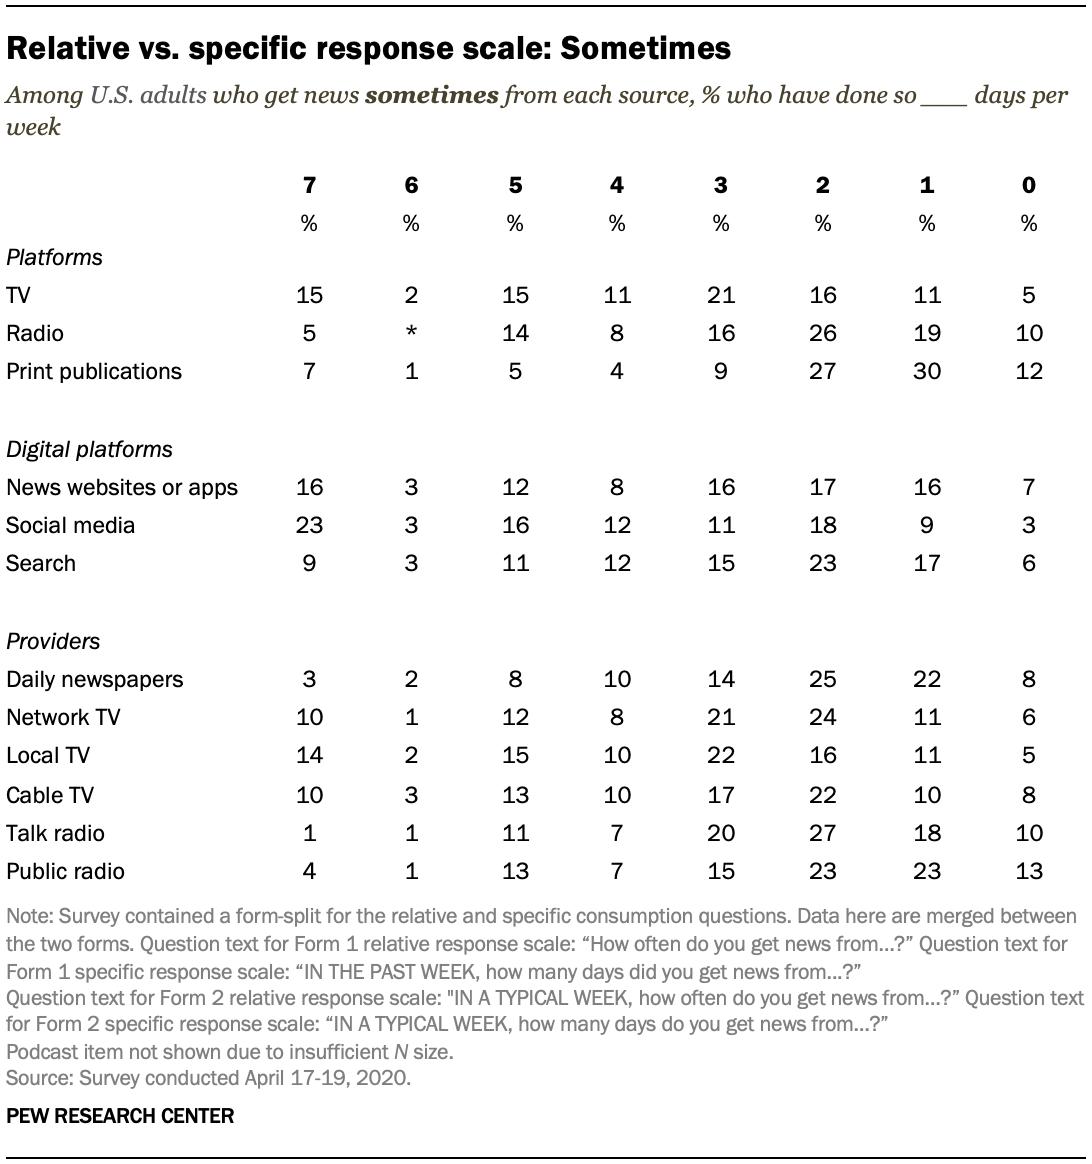 Relative vs. specific response scale: Sometimes